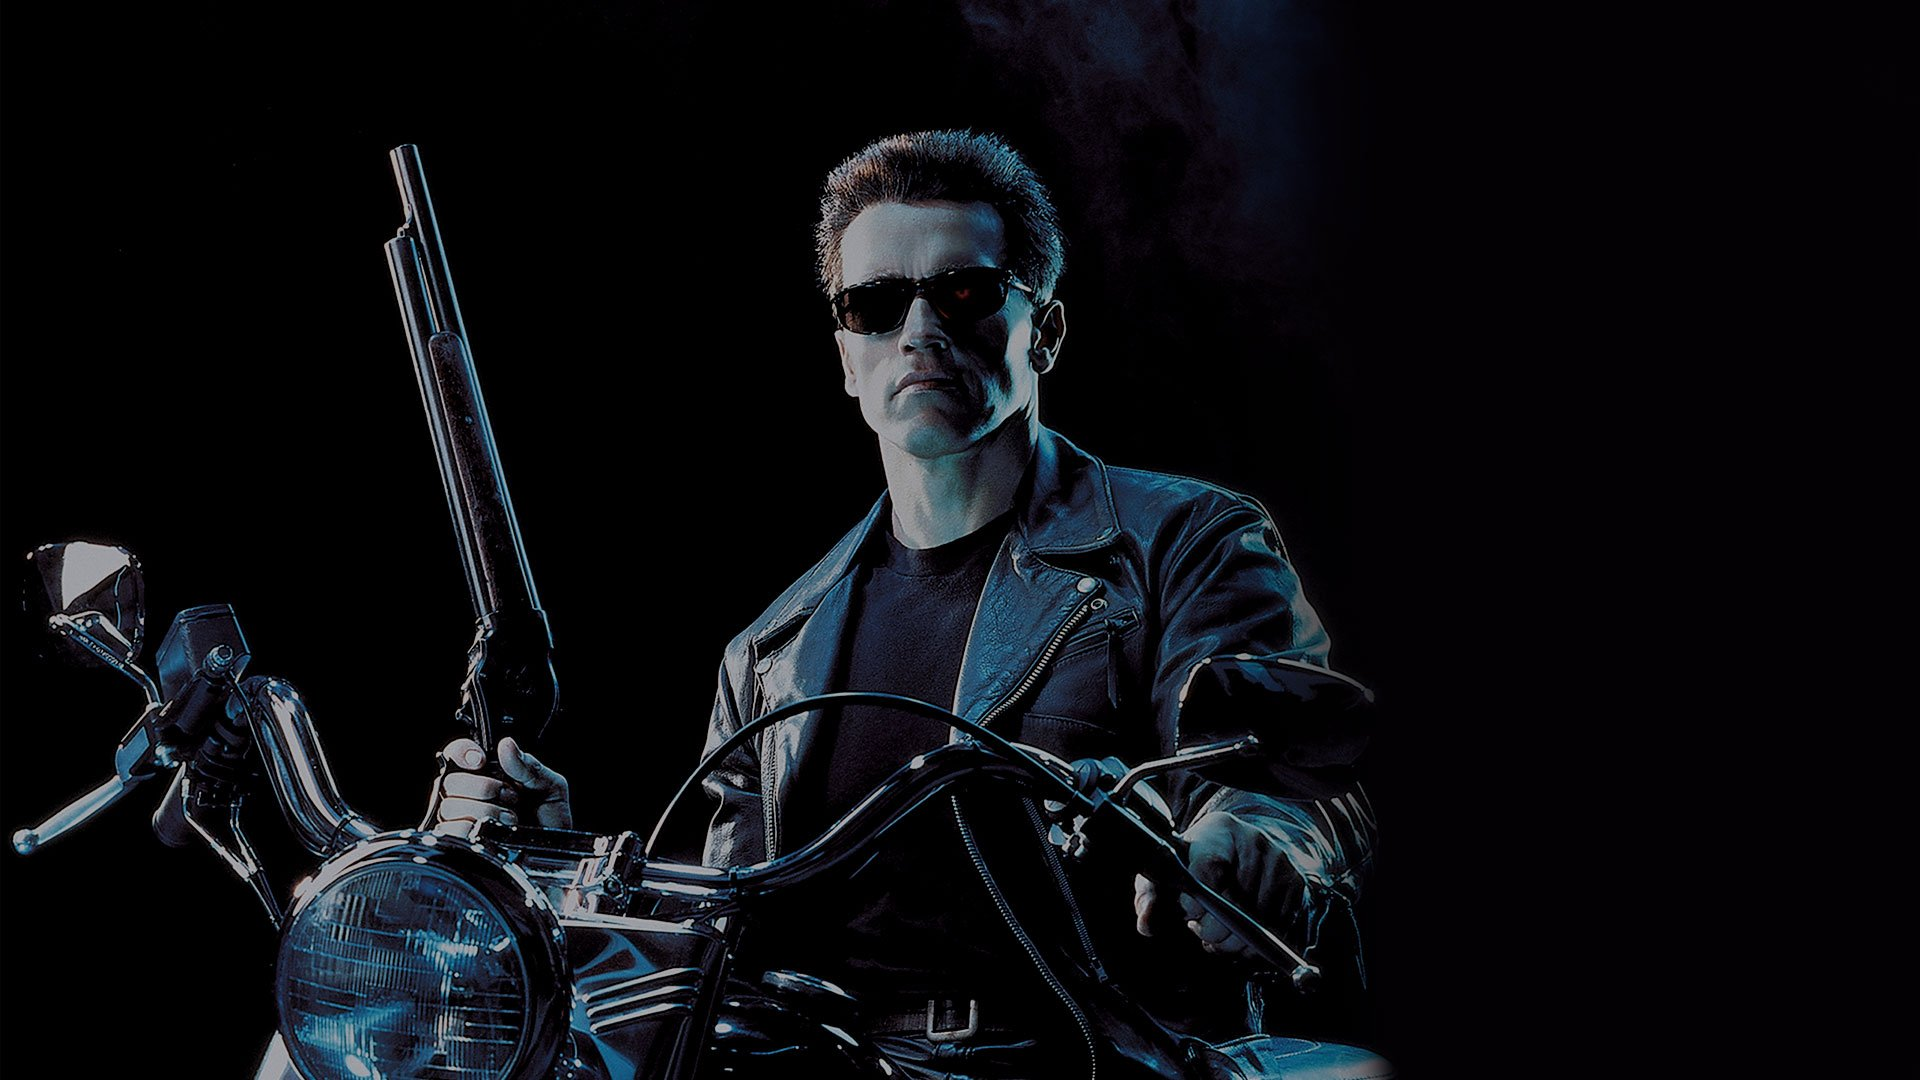 Terminator 2, T2, Terminator 2: Judgment Day